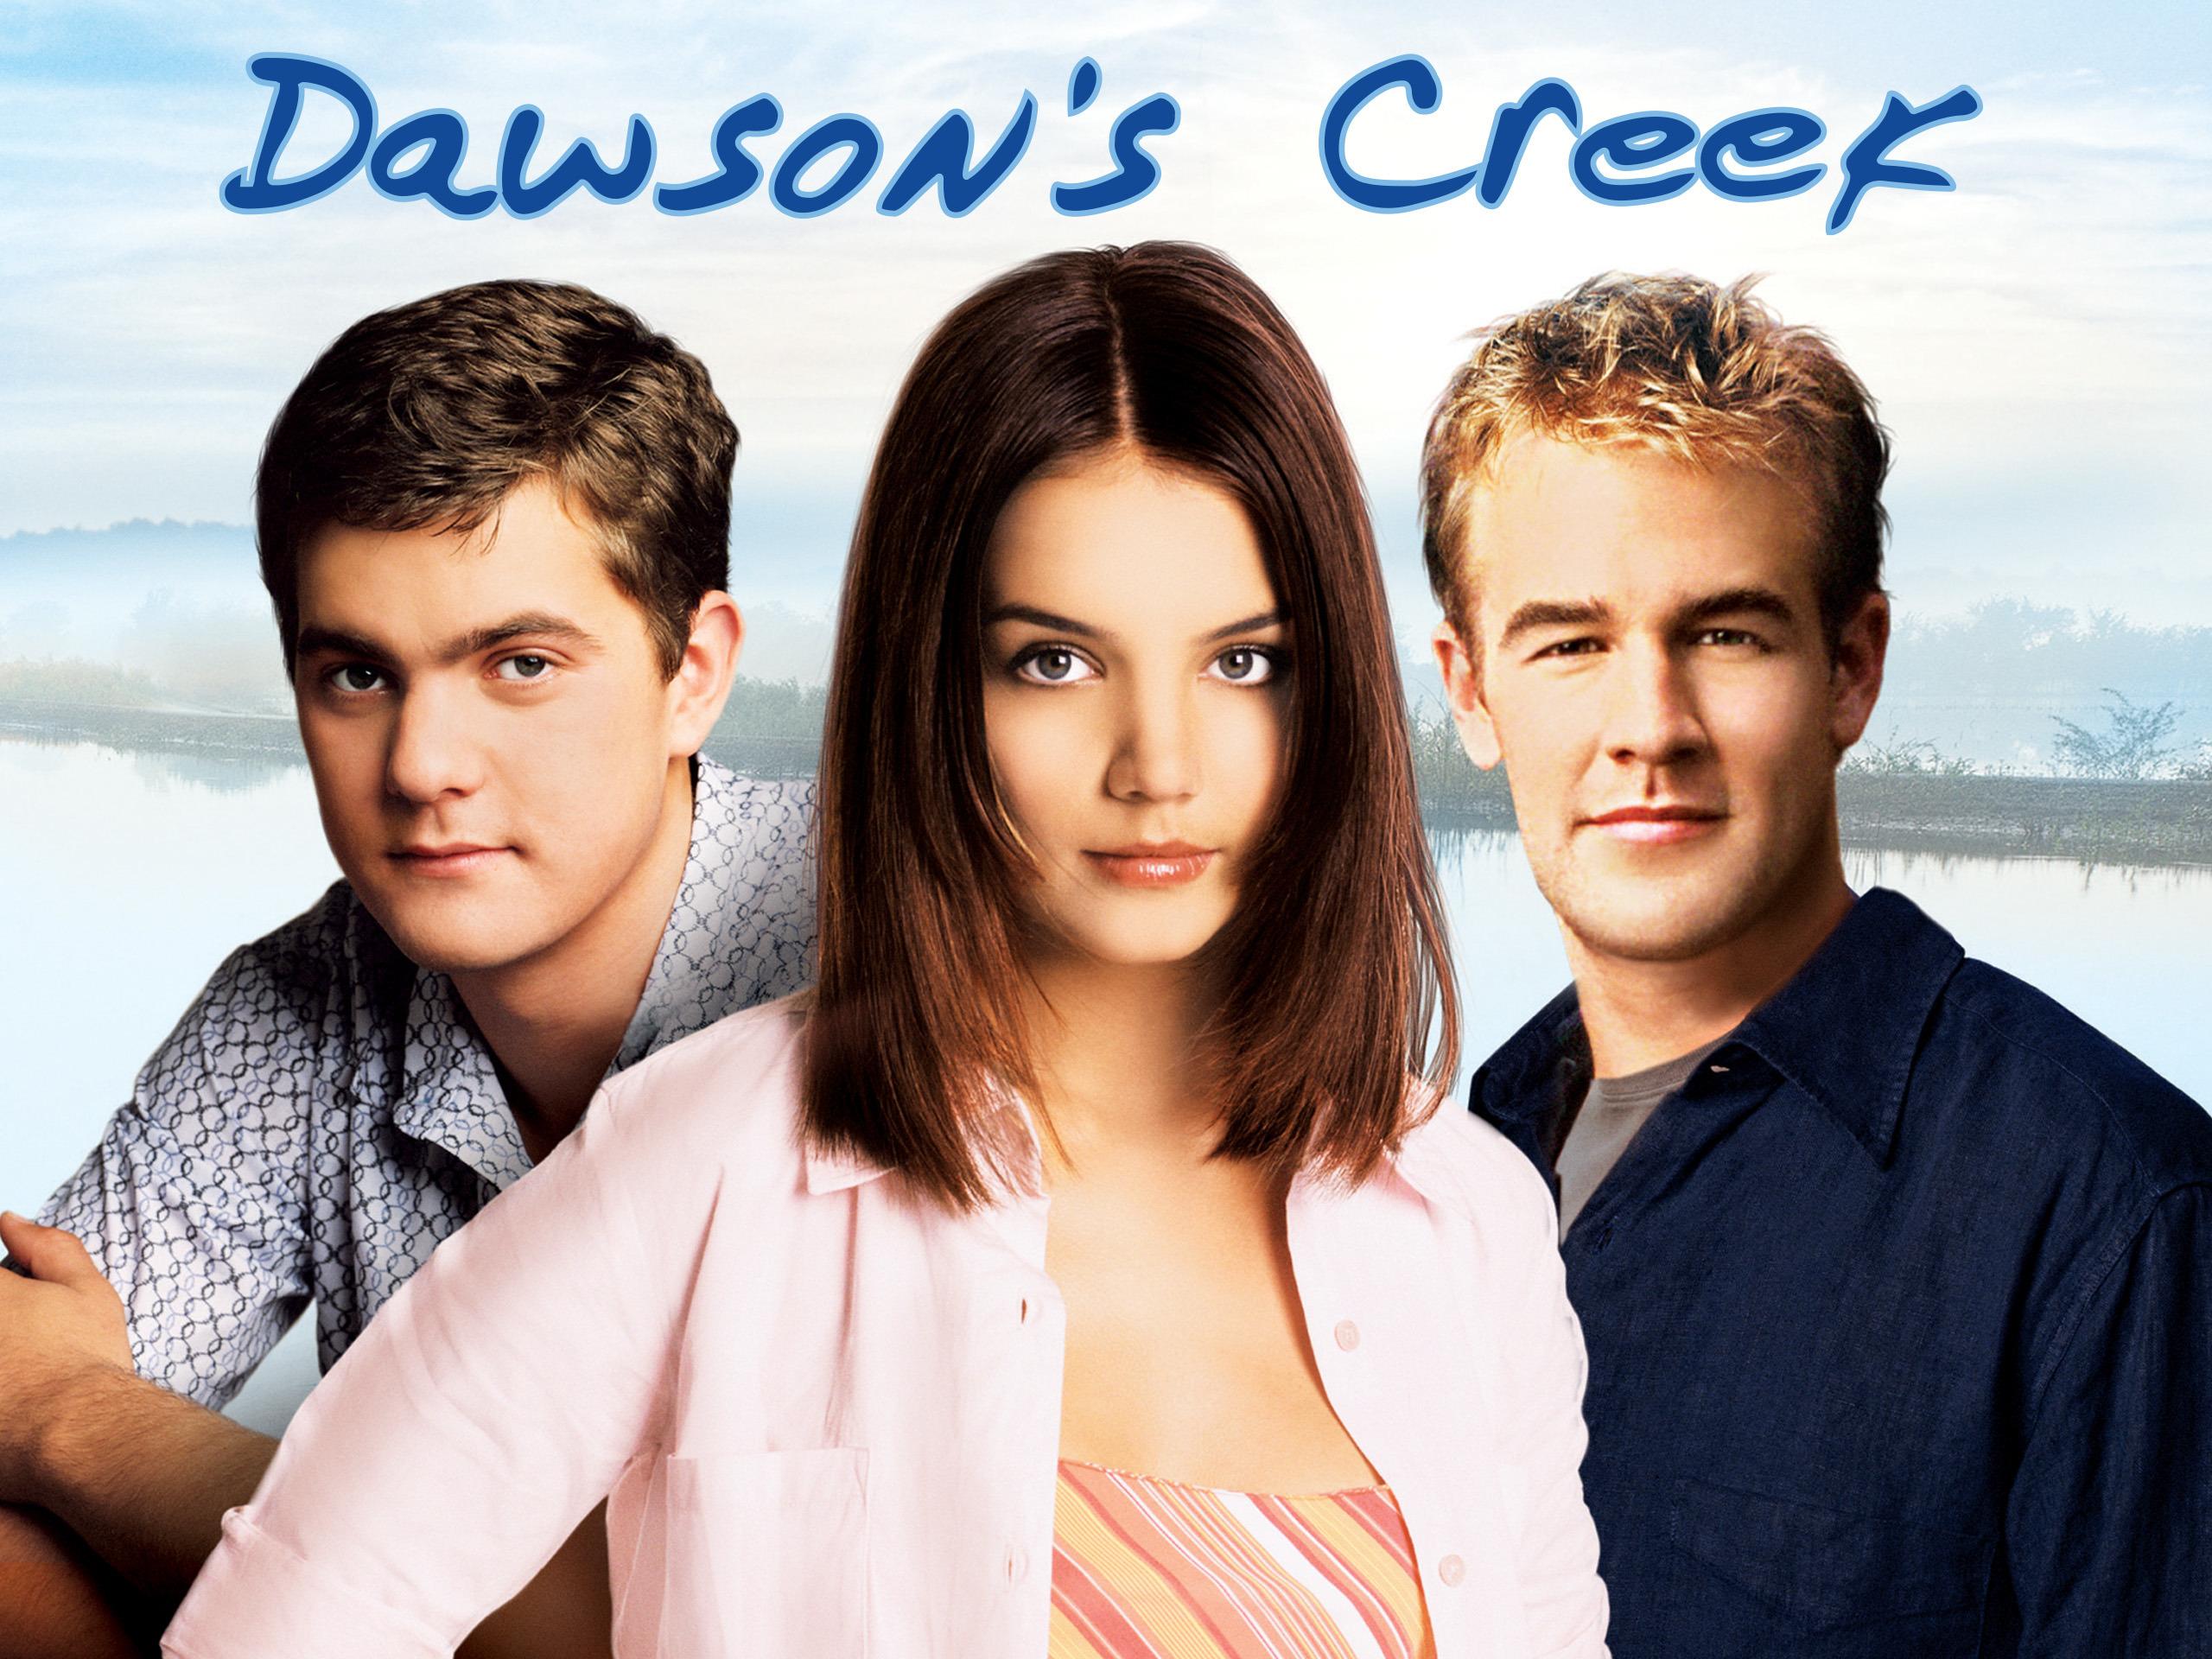 Dawson's creek tv show